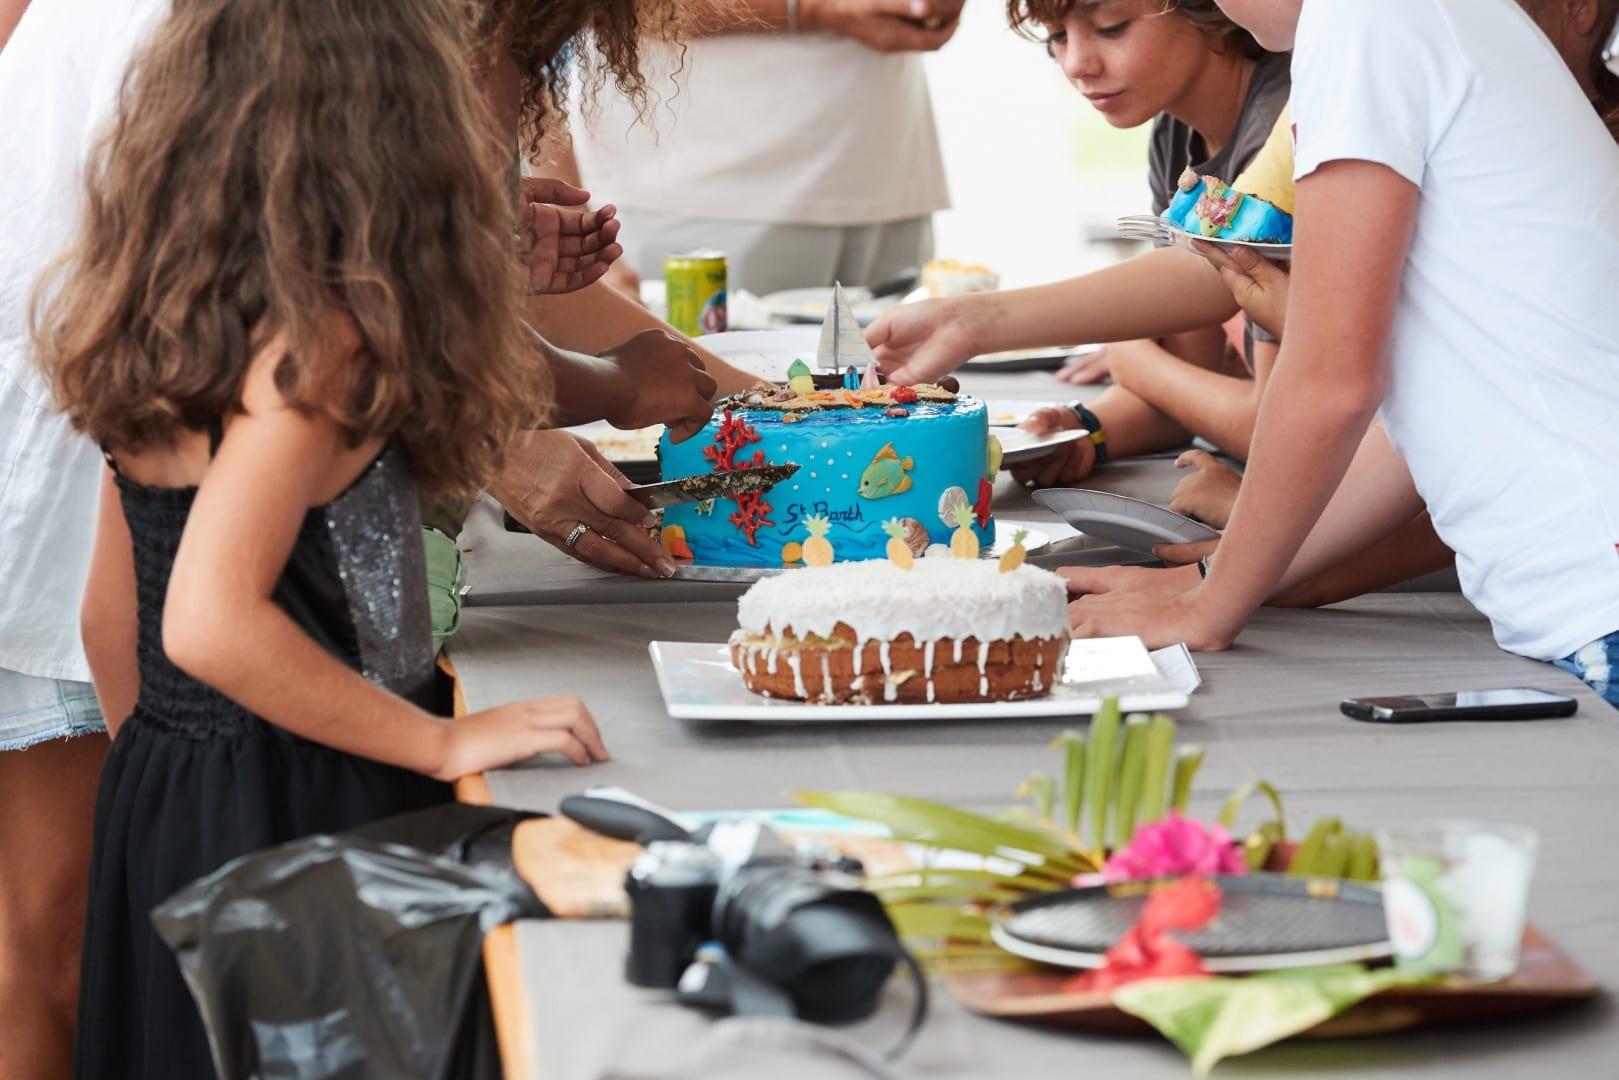 Children-St-Barth-Gourmet-Festival-UltraVilla